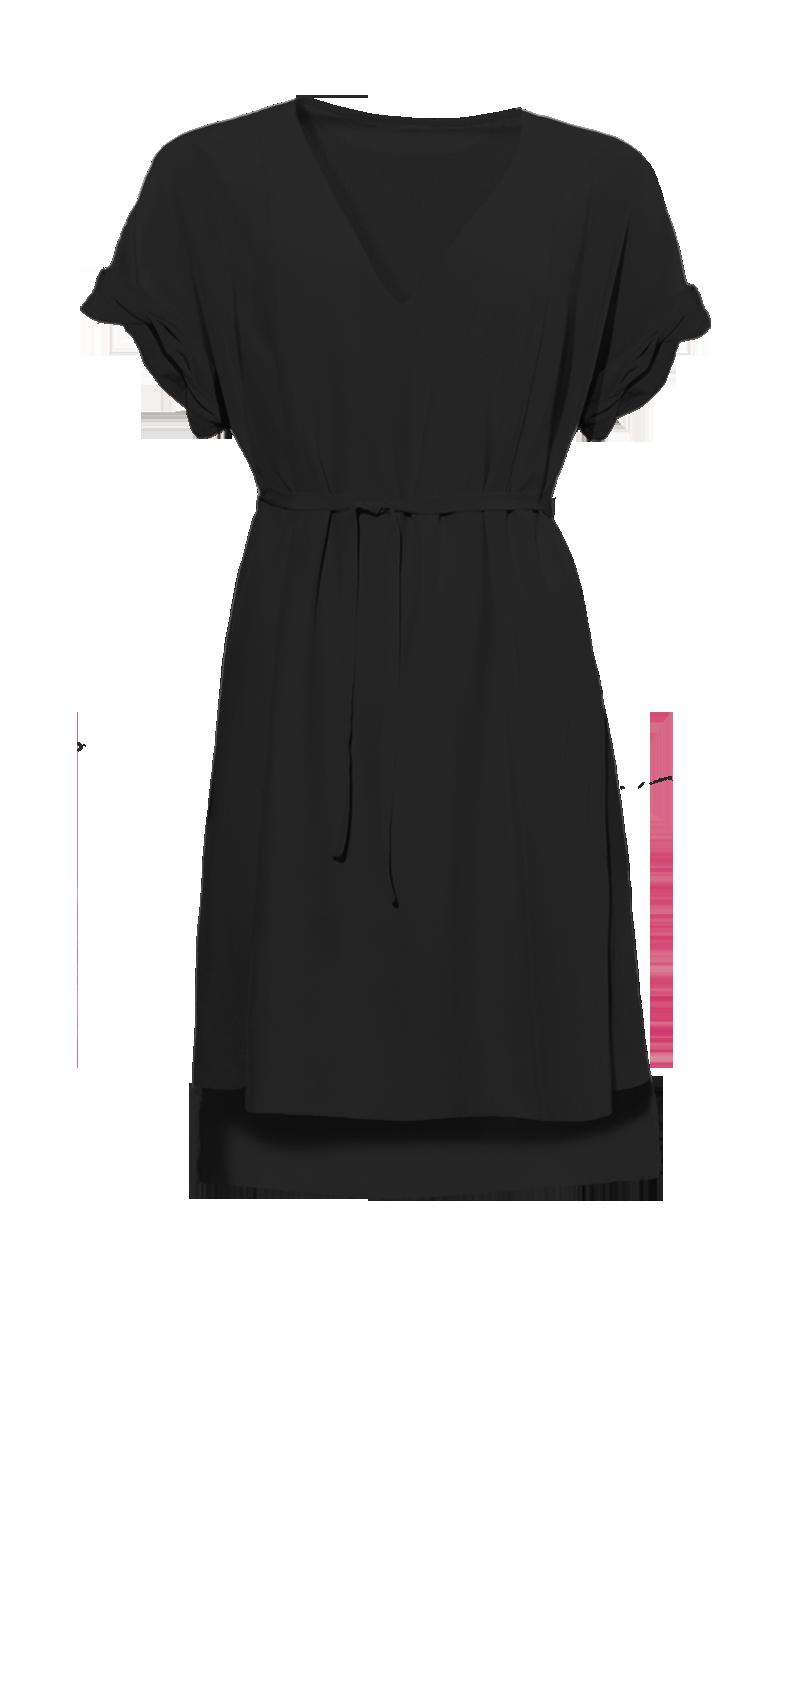 Bild 1 av Day silk dress